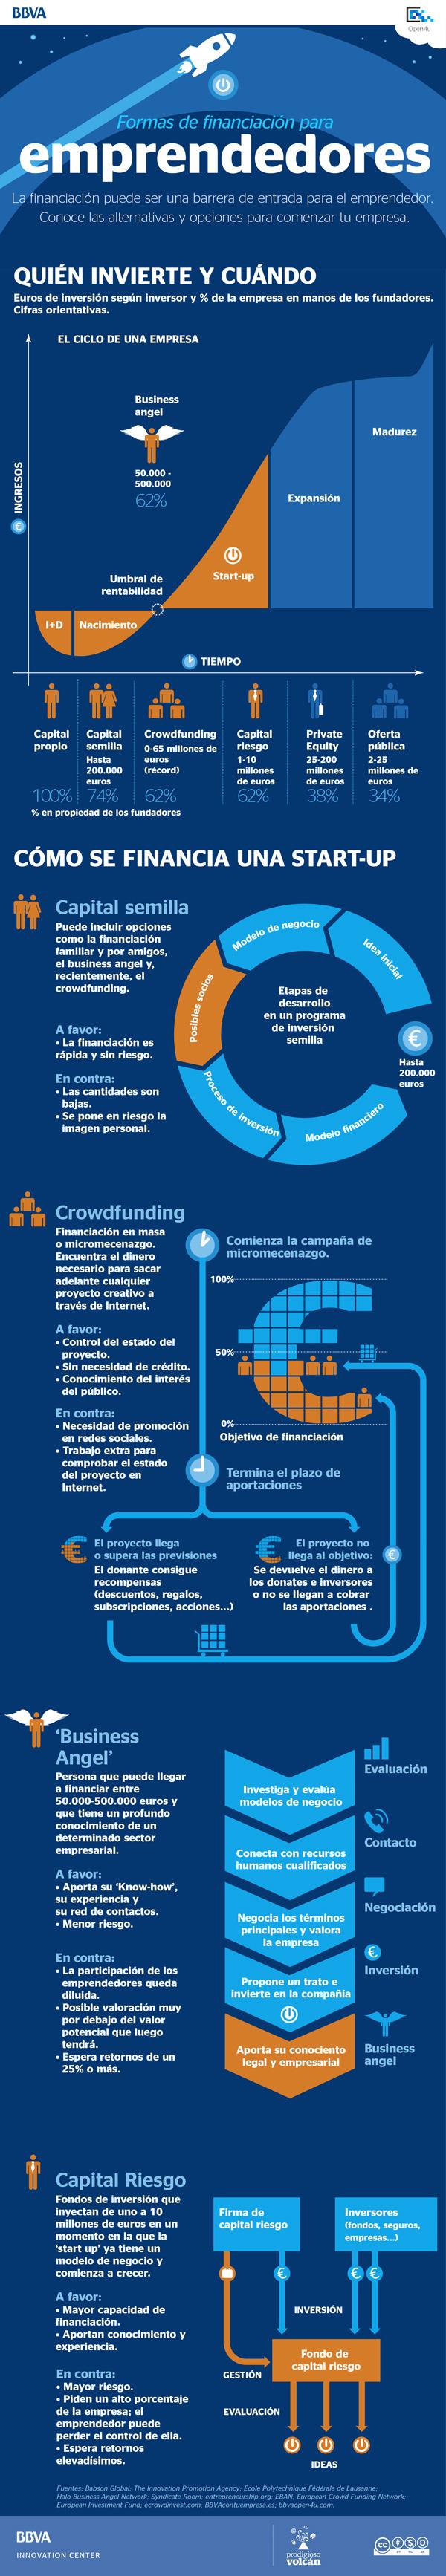 formas-financiacion-emprendeores-infografia